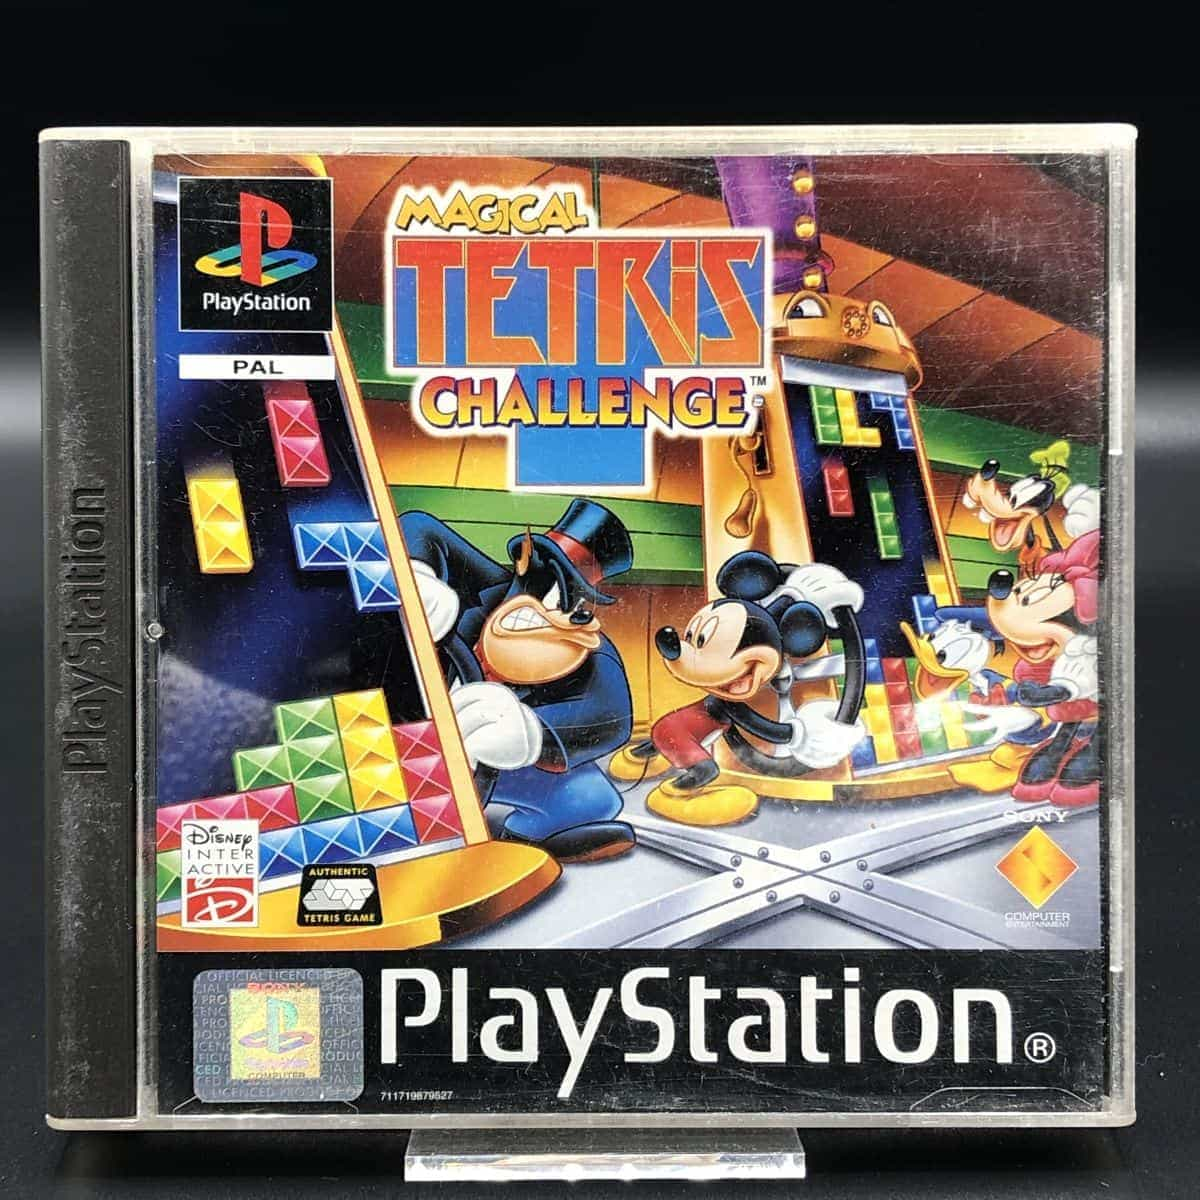 PS1 Magical Tetris Challenge (Komplett) (Gut) Sony PlayStation 1